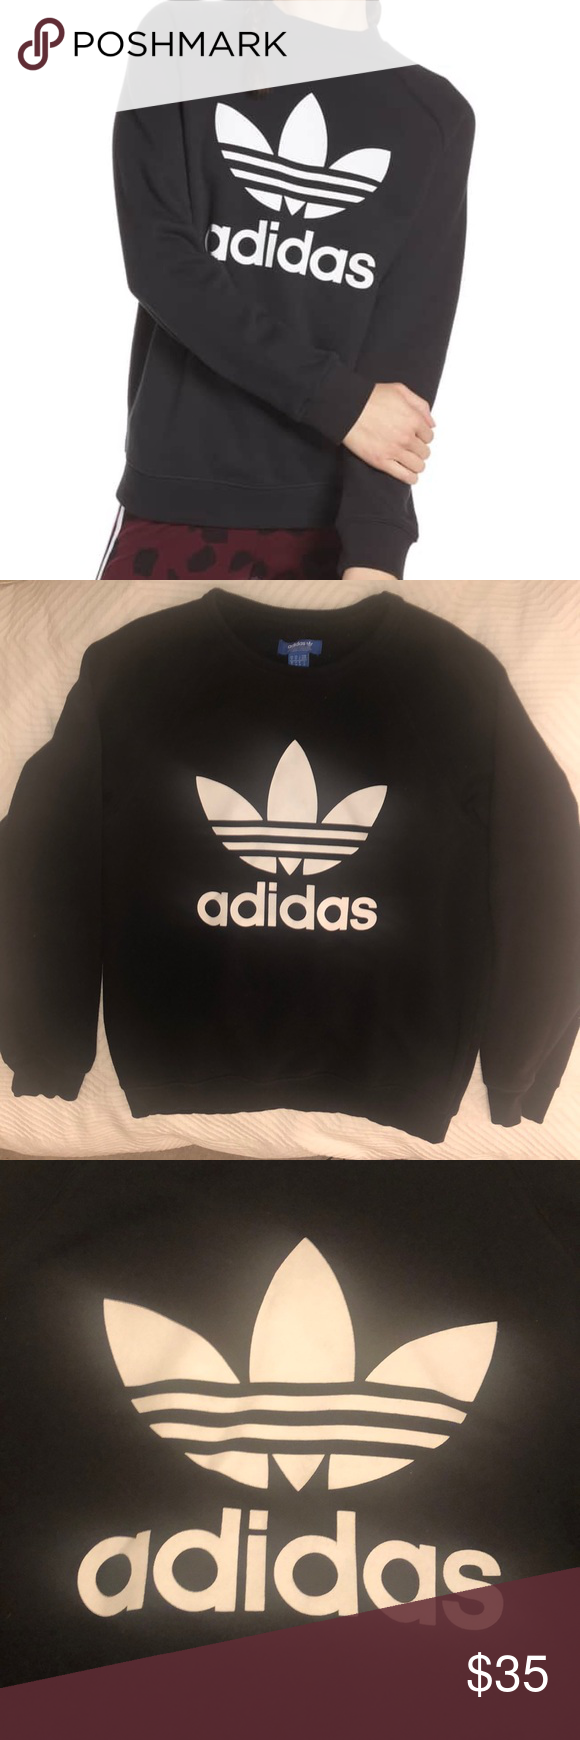 Adidas Originals Trefoils Sweatshirt Black Medium Black Sweatshirts Adidas Tops Sweatshirts [ 1740 x 580 Pixel ]